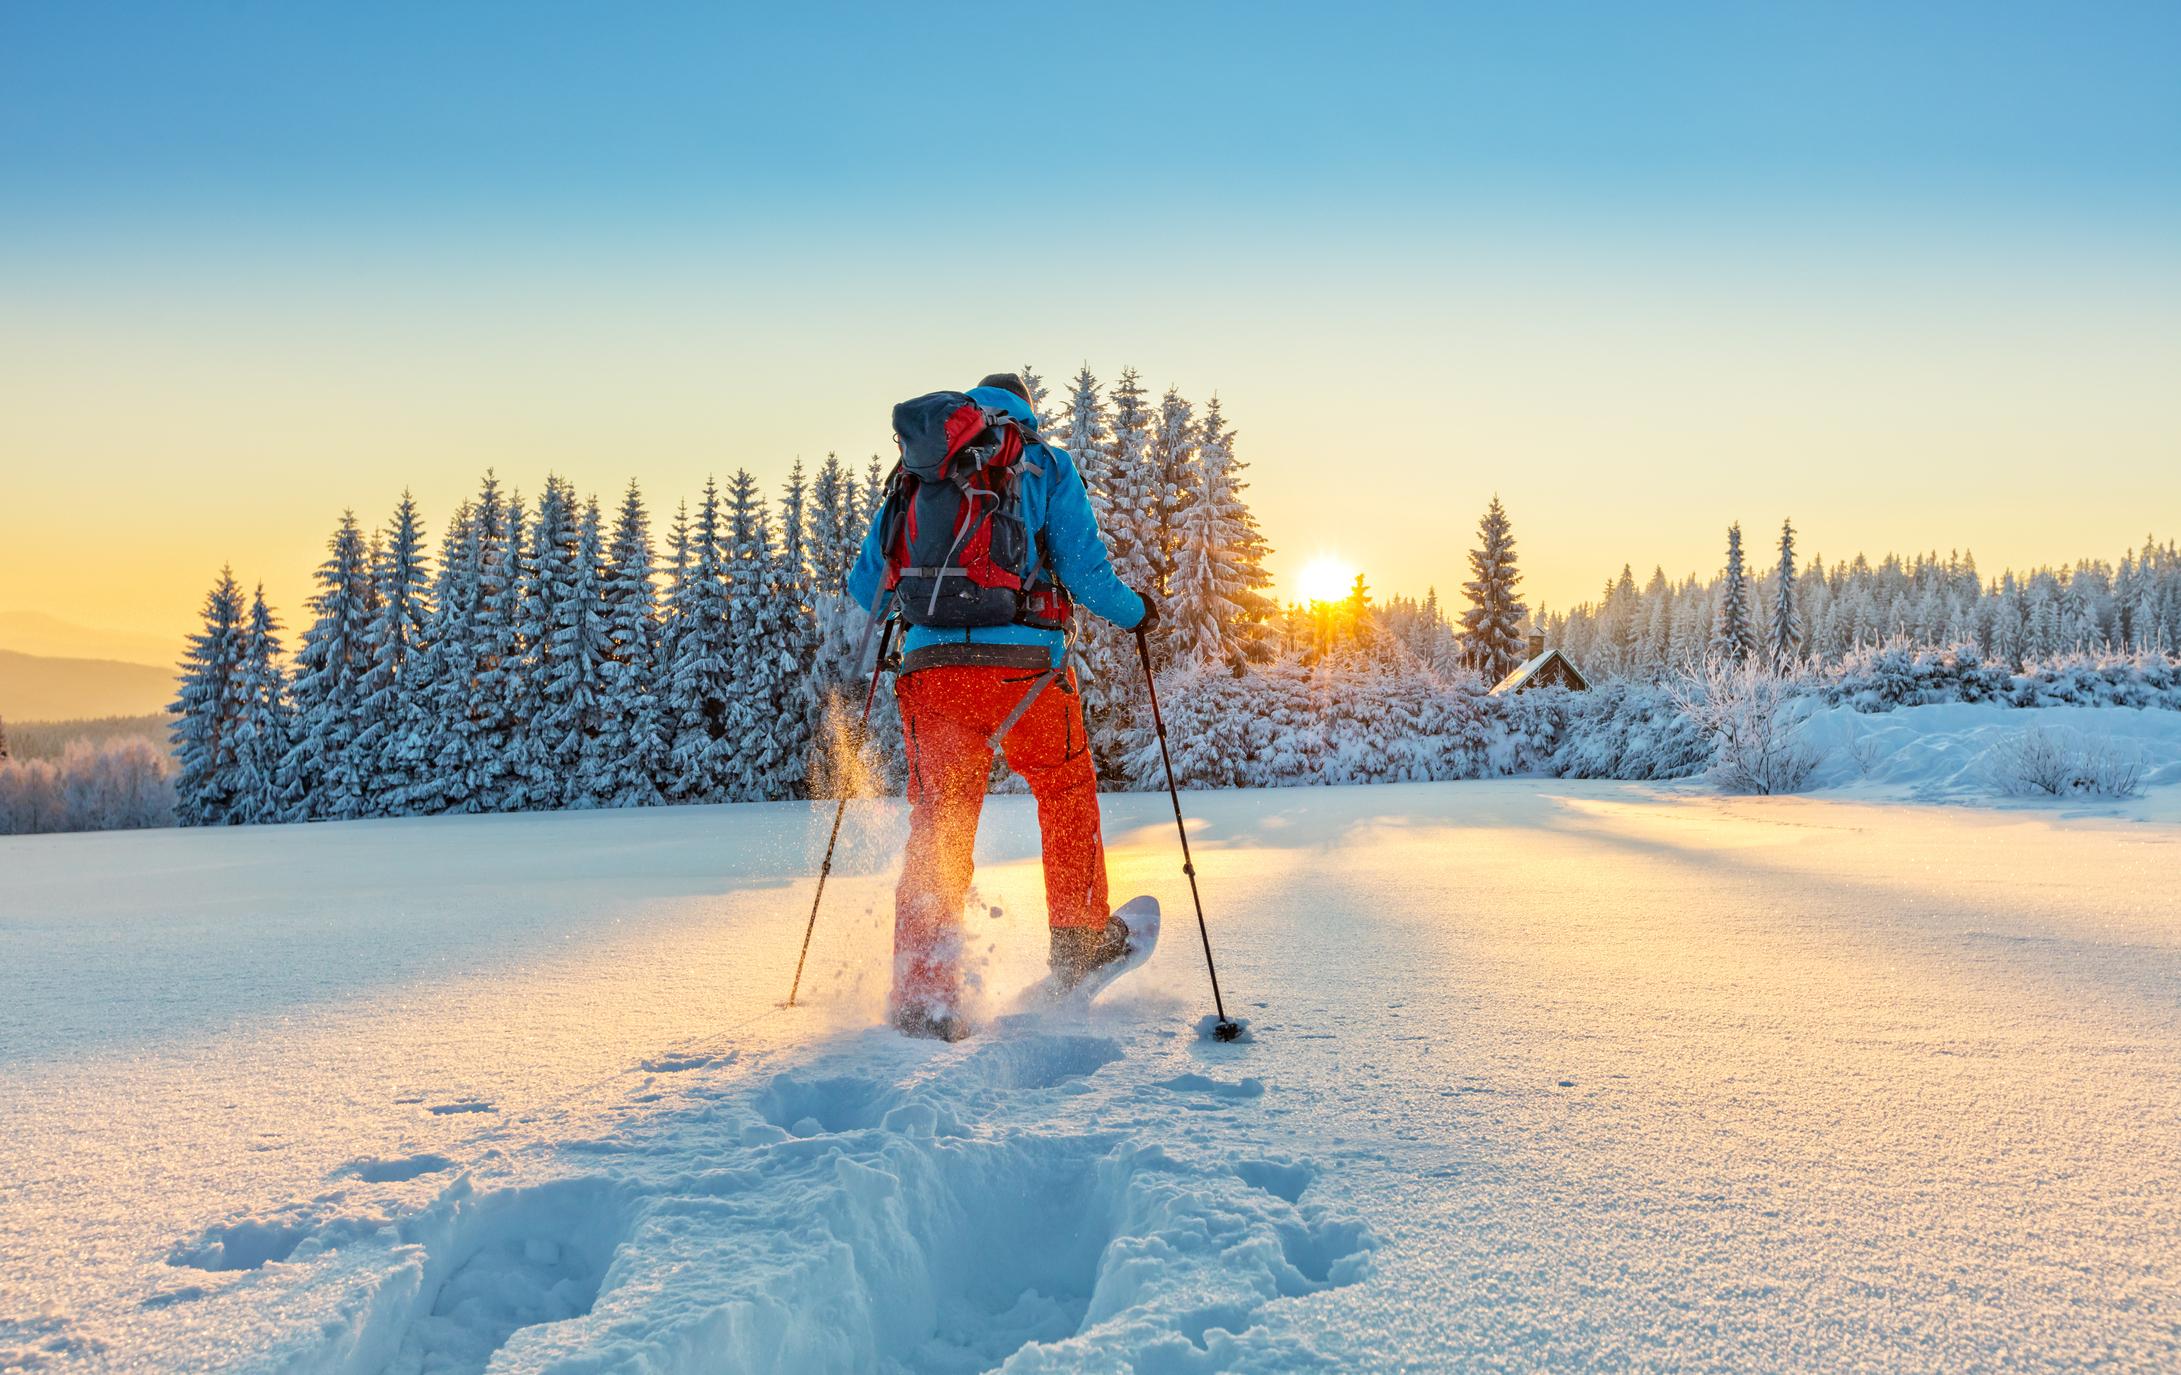 Bavarian Forest Ski, Snowboard and Snowshoe